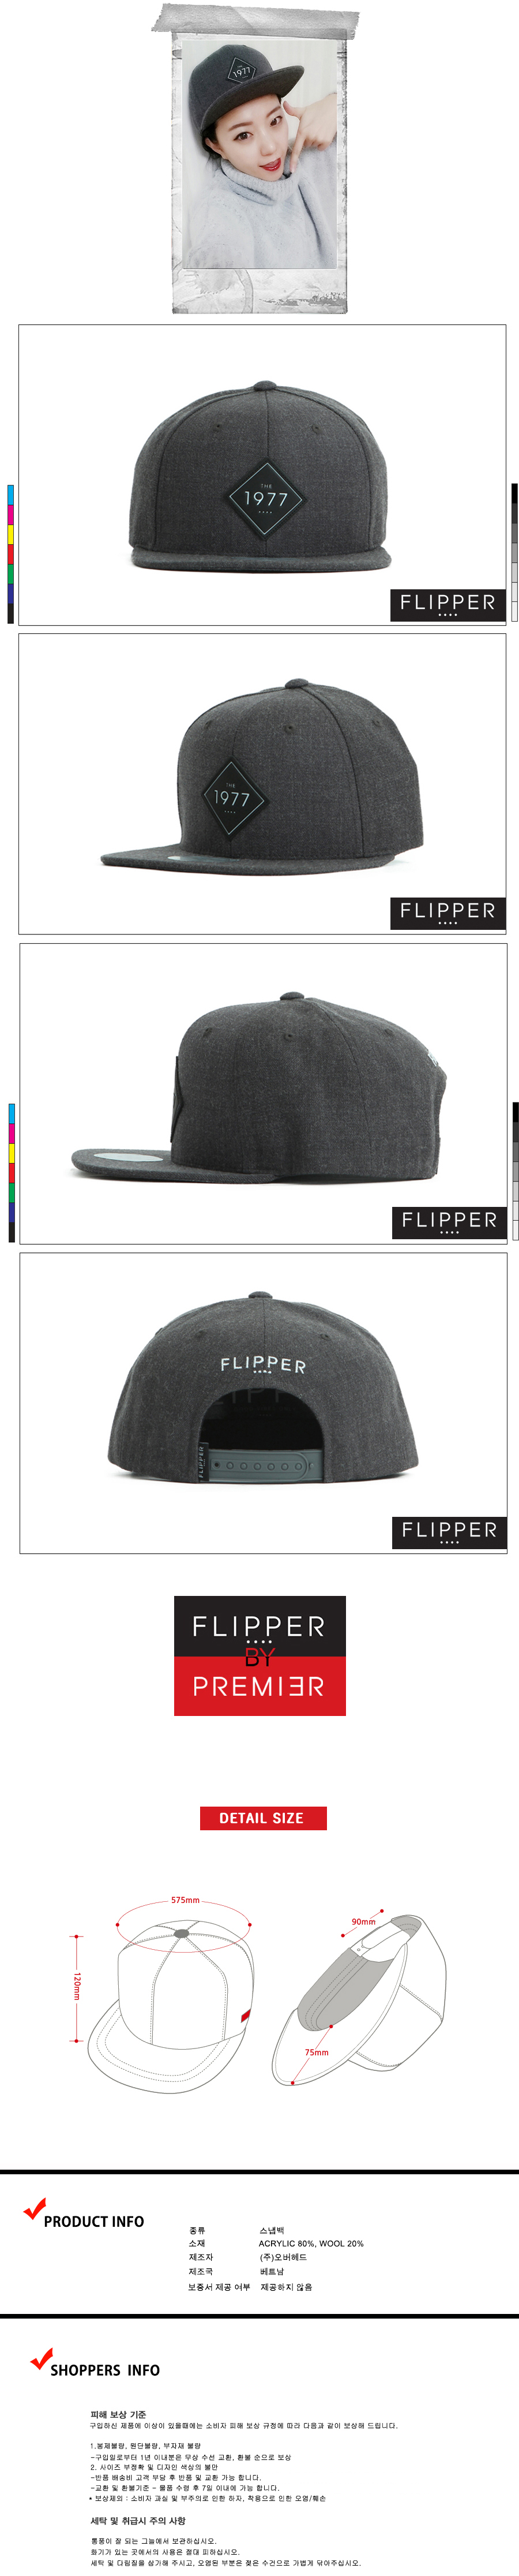 [ PREMIER ] [Premier] Flipper Snapback 1977 Charcoal (FL013)